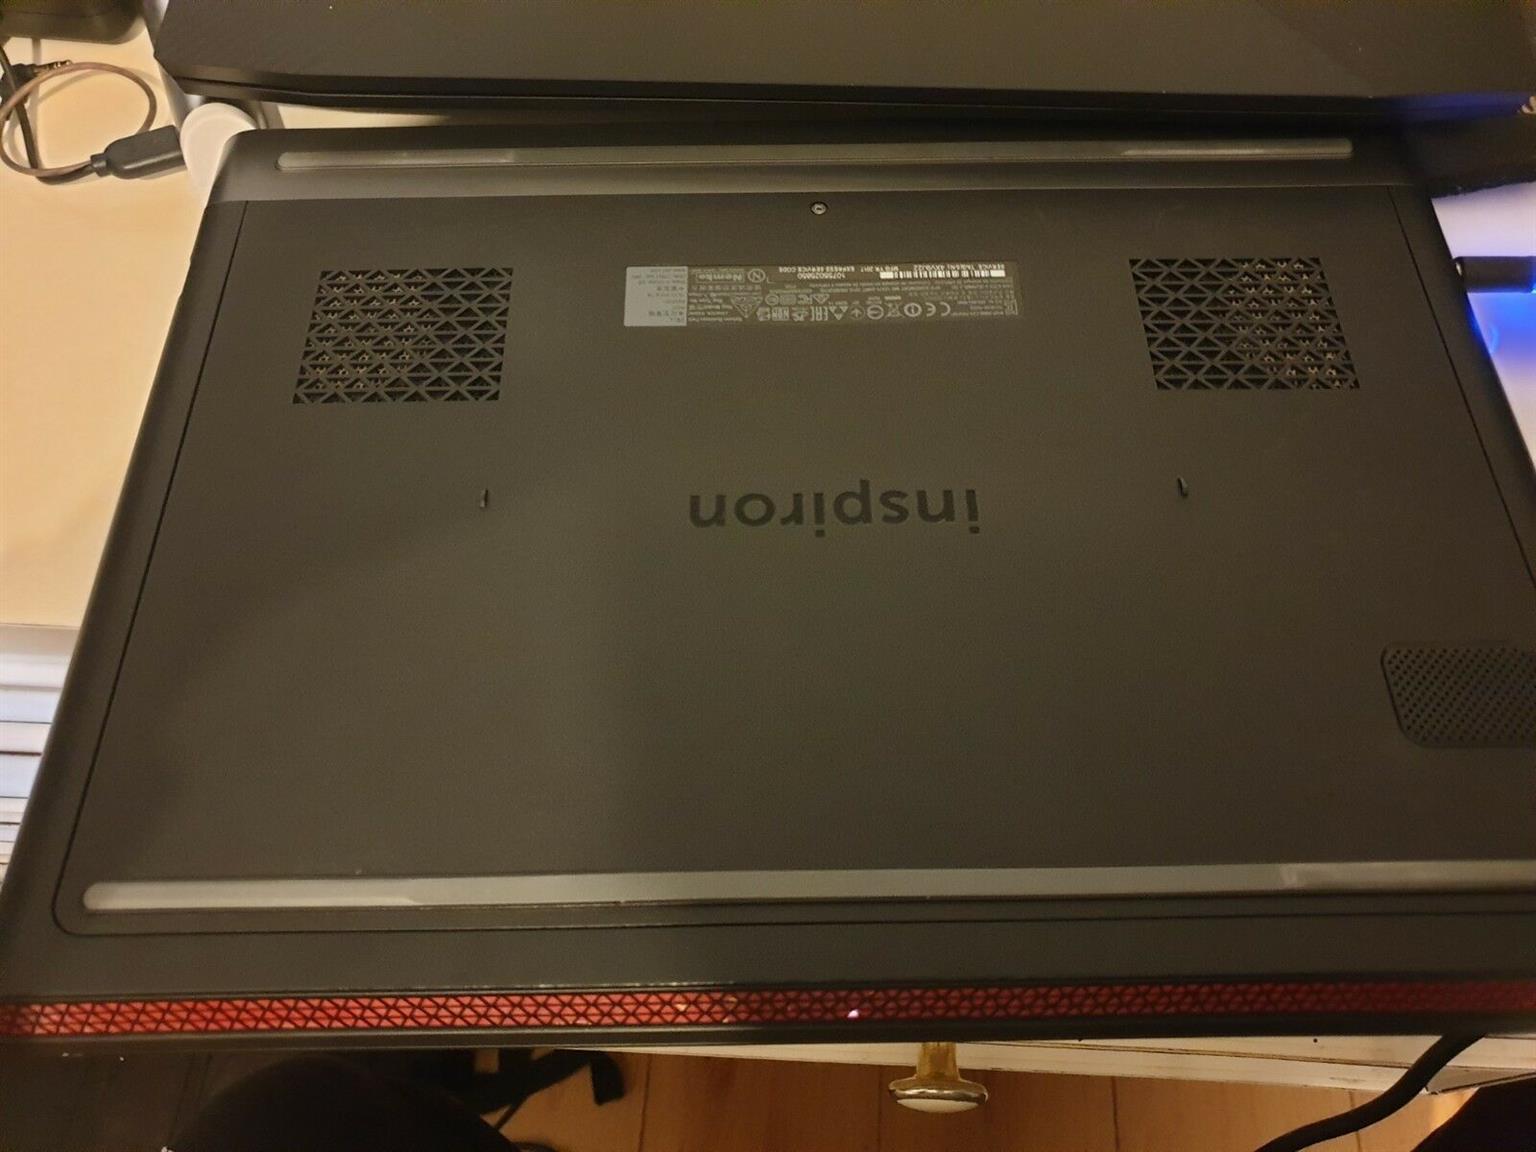 Dell inspiron 15 inch 7000 gaming laptop refurb